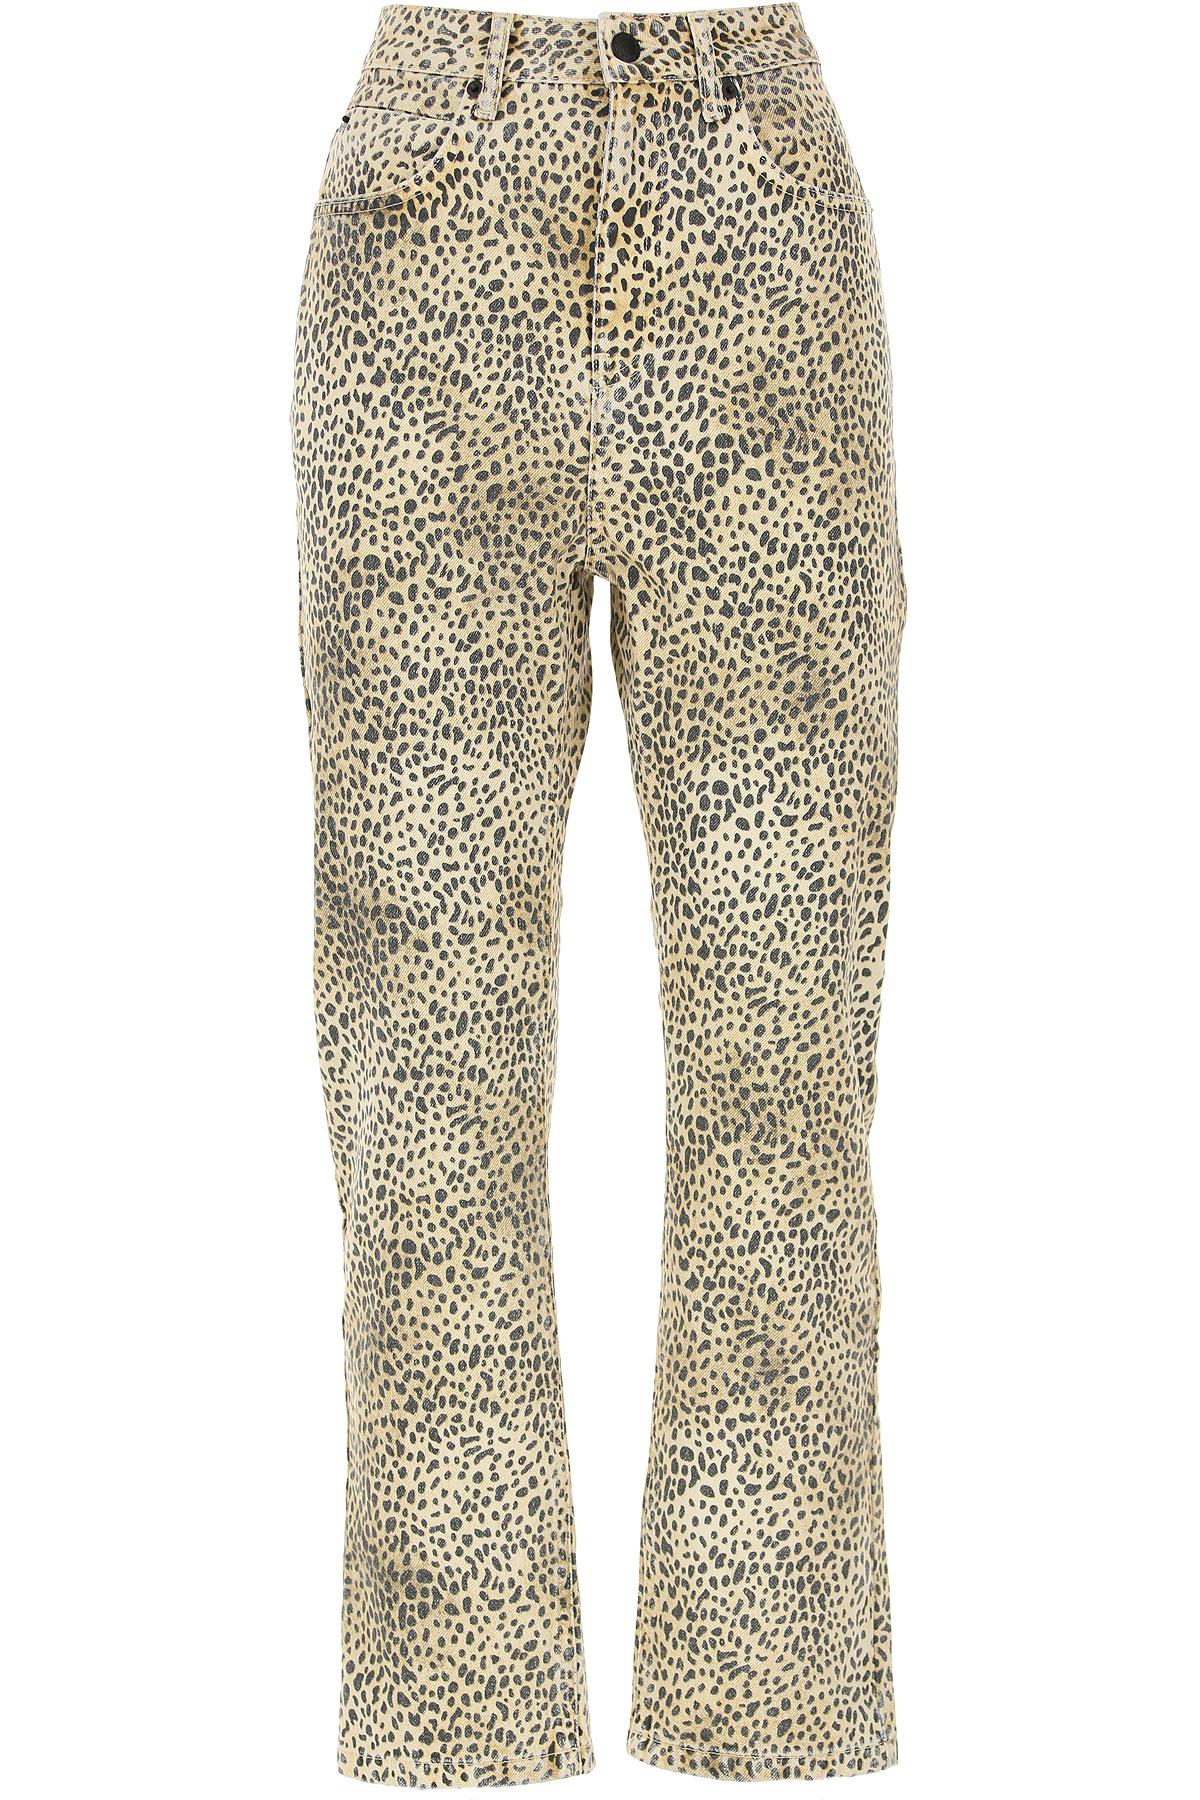 Alexander Wang Pants for Women On Sale, Leopard, Cotton, 2019, 25 26 27 28